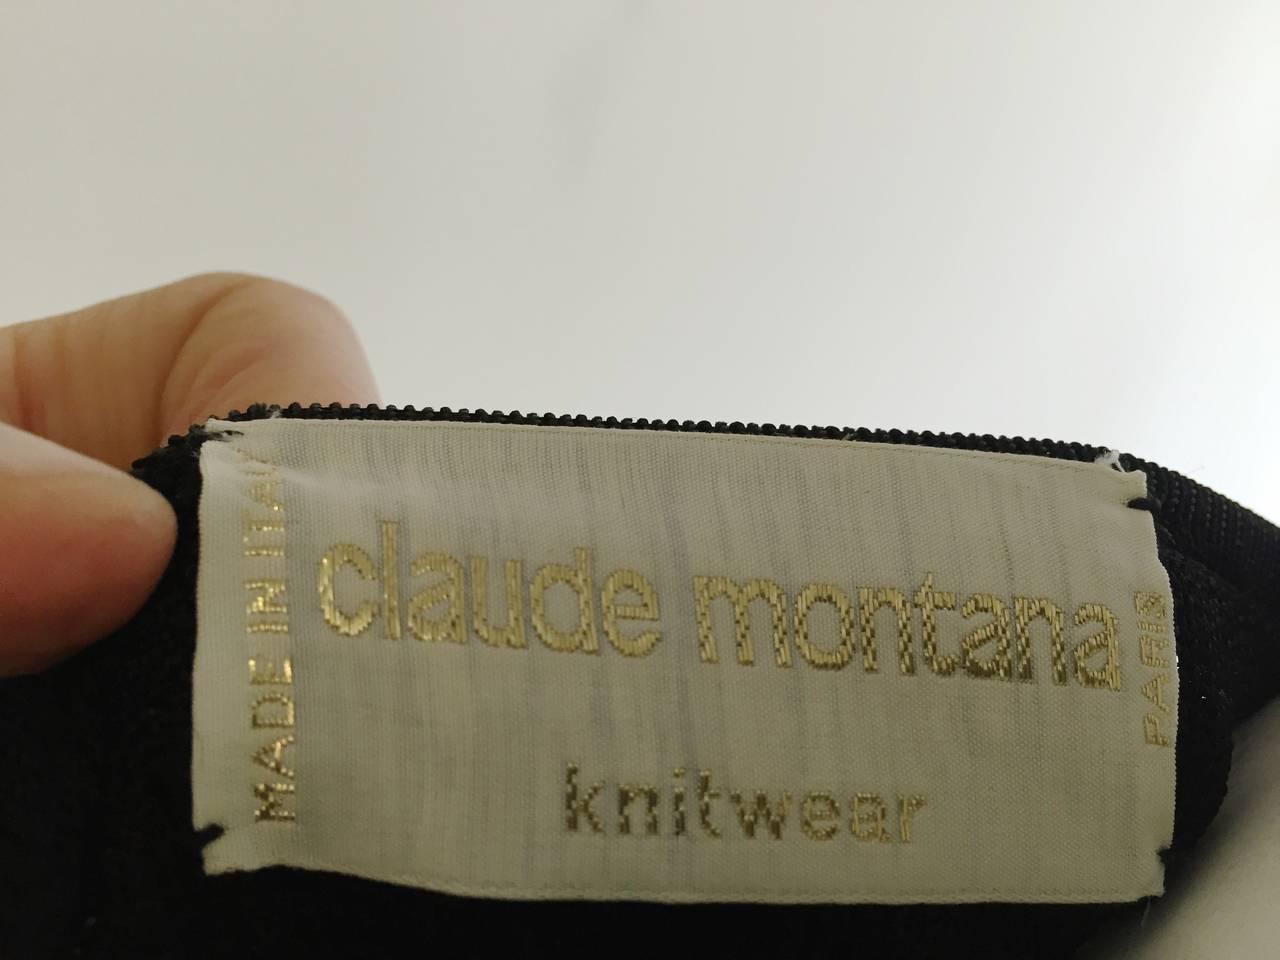 Claude Montana 80s Black Top Size 4 / 6. 8